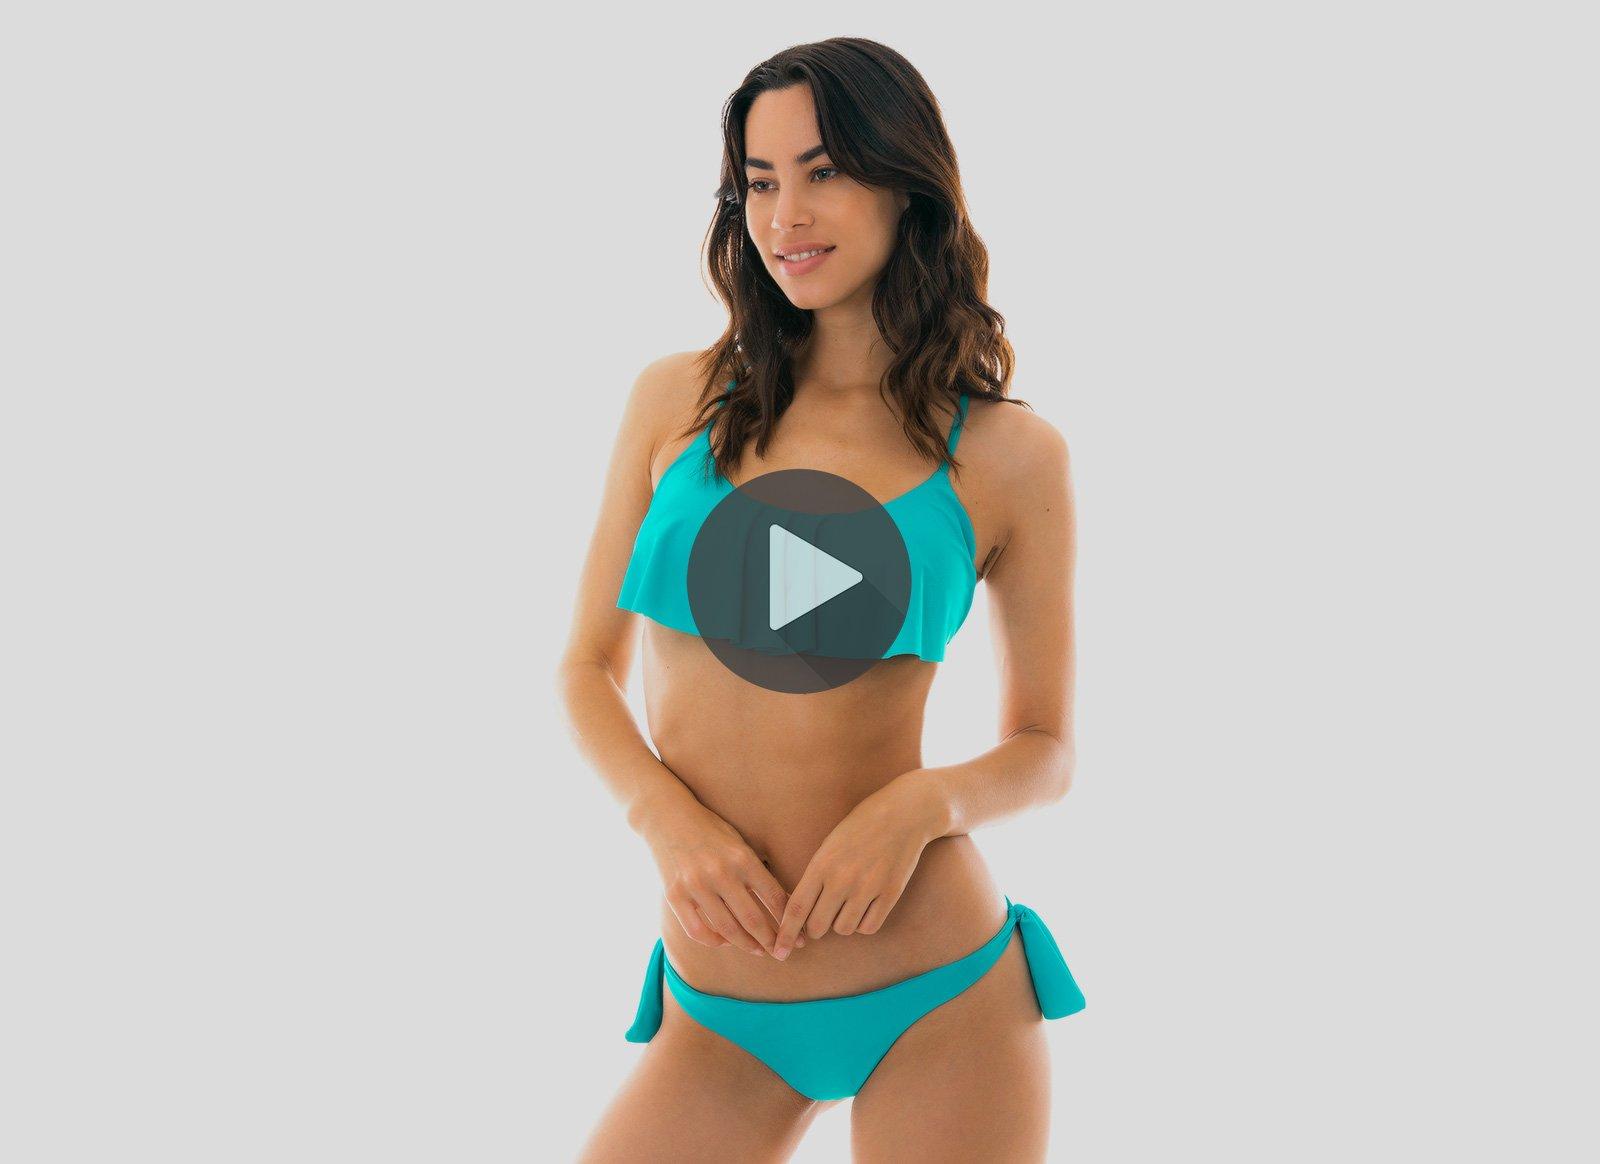 ac4cc67e08 Turquoise Swimsuit   swimwear